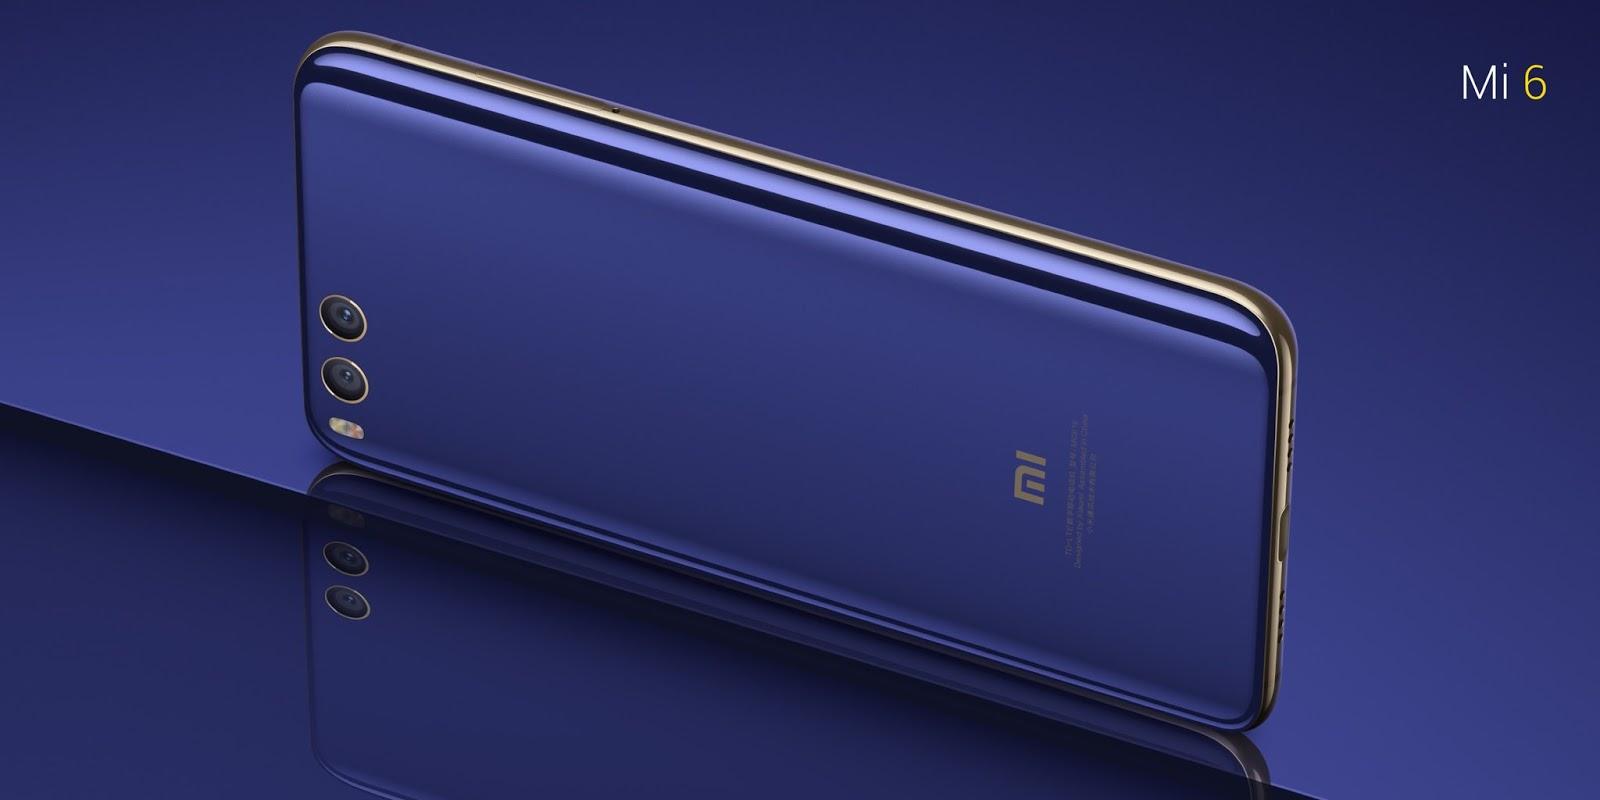 Дождались: Xiaomi Mi 6 представлен официально - 2